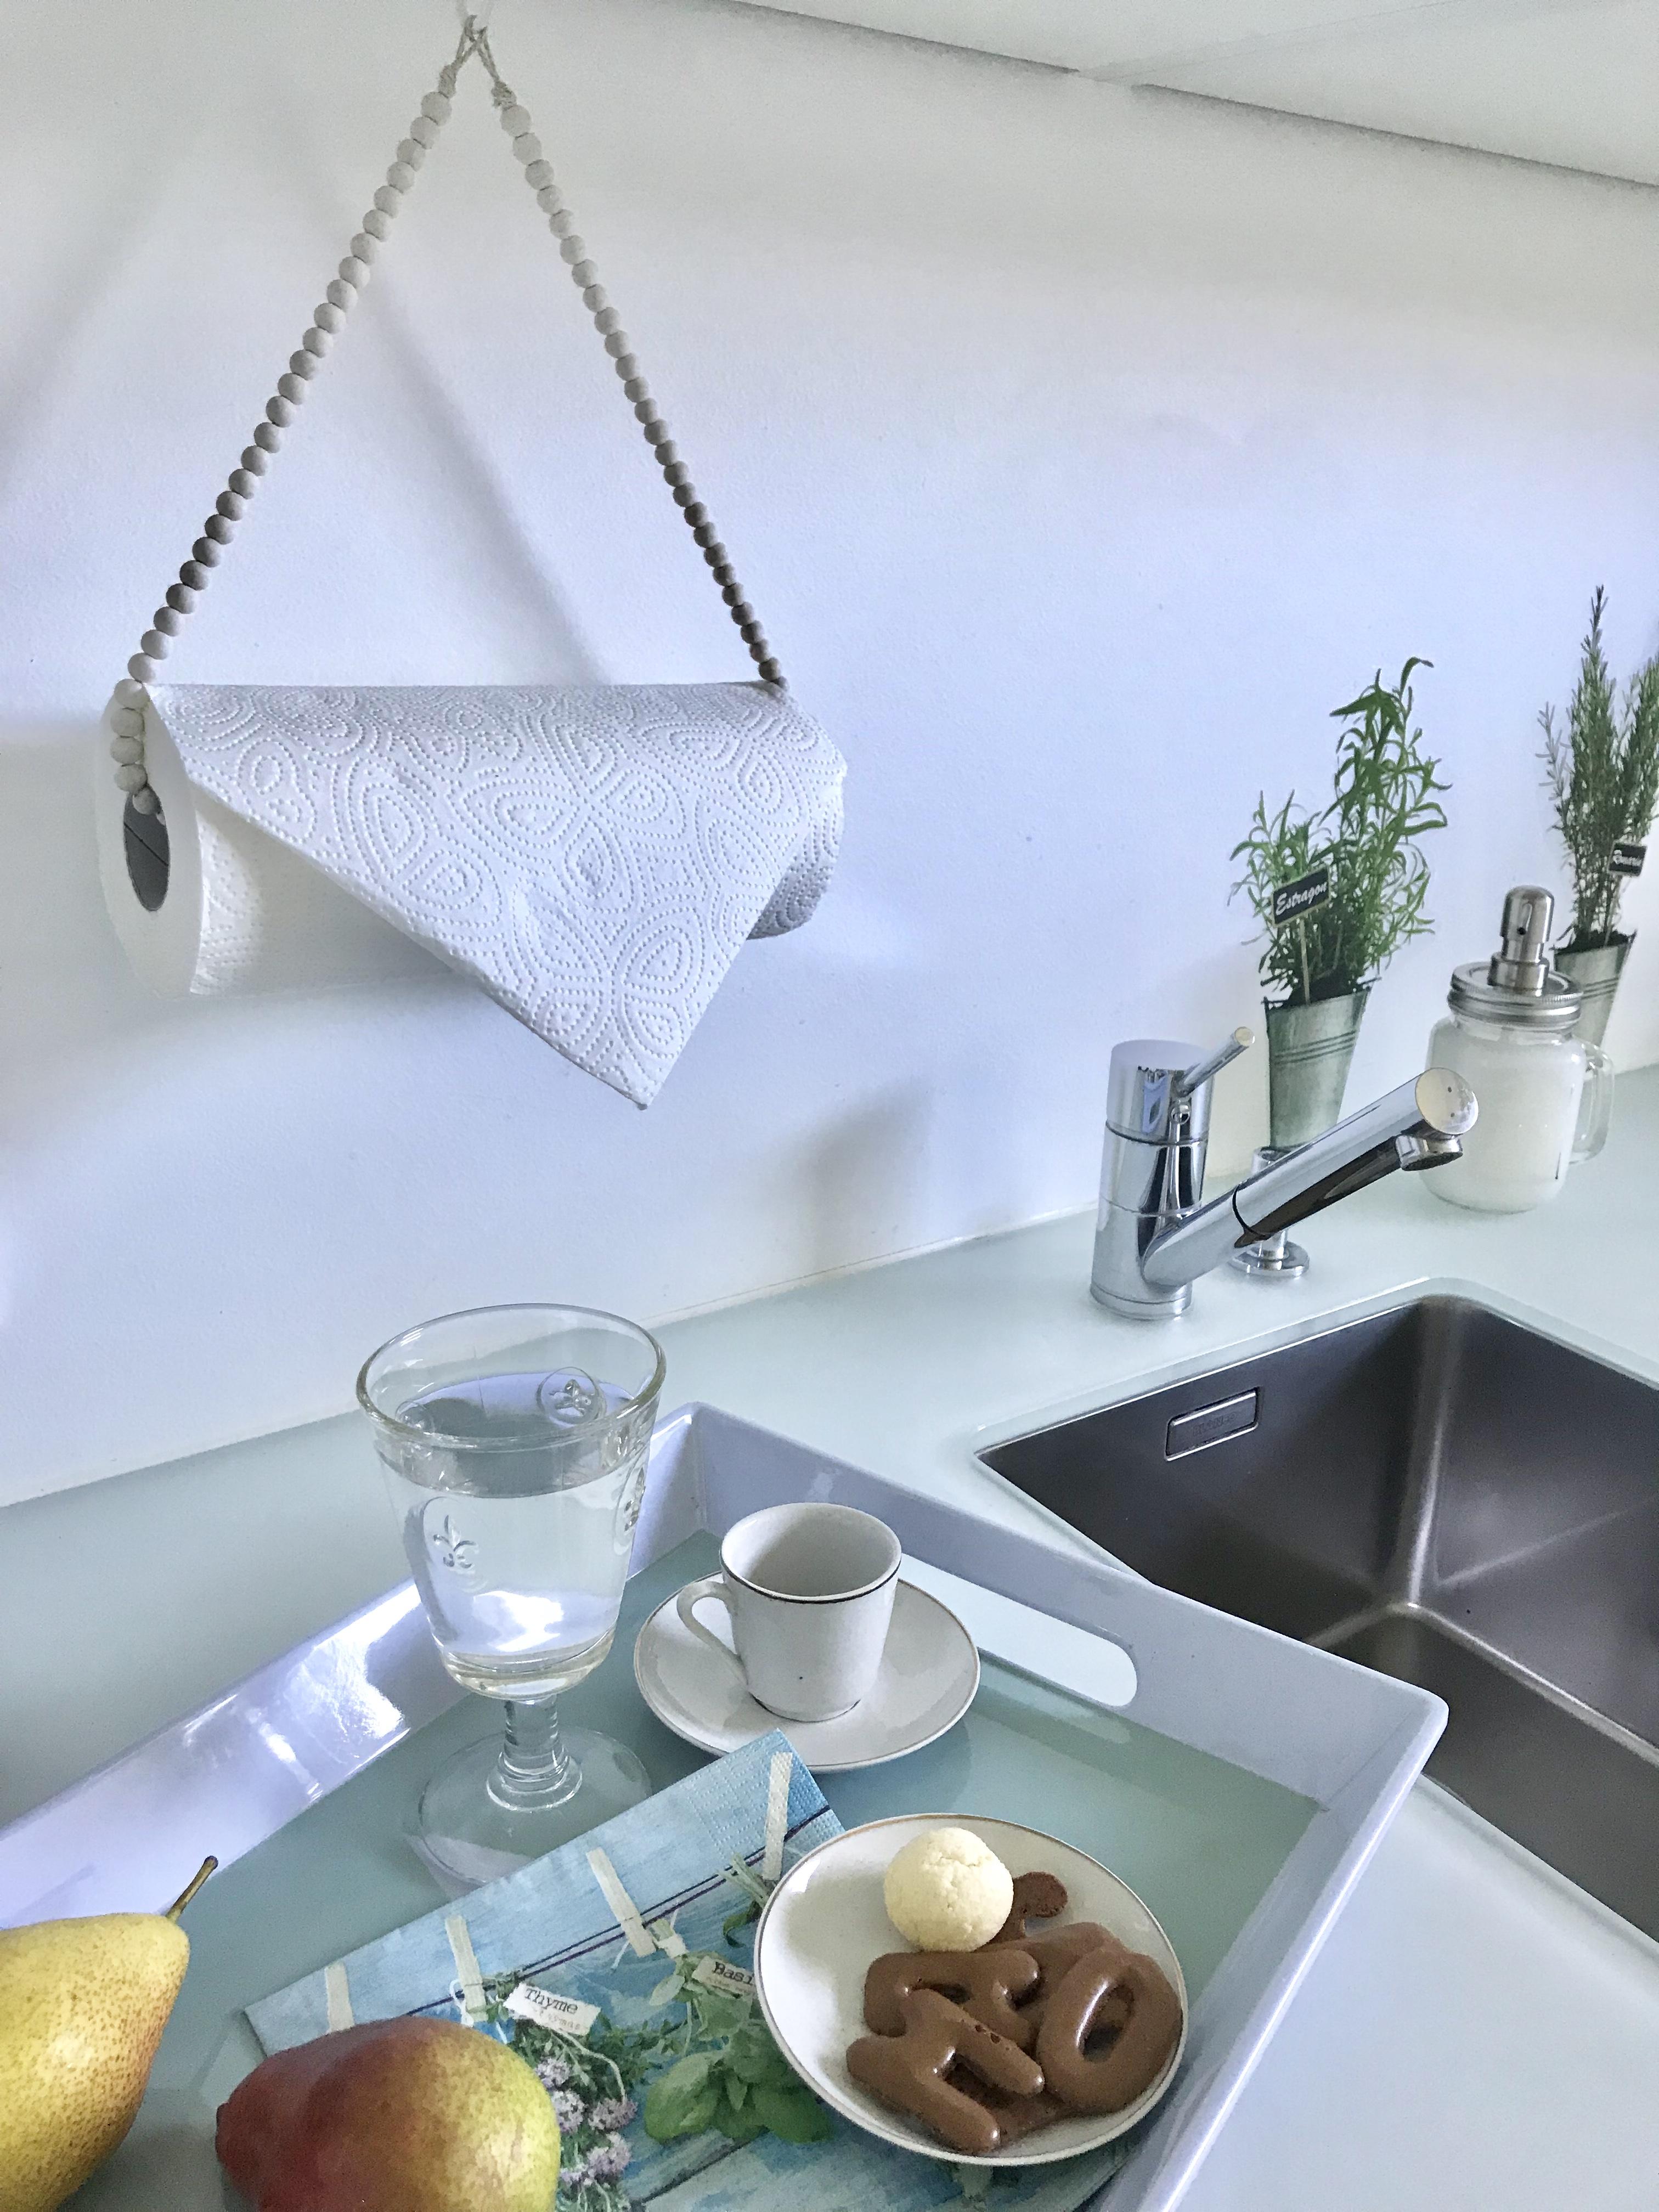 Küchenrollen-Gadget